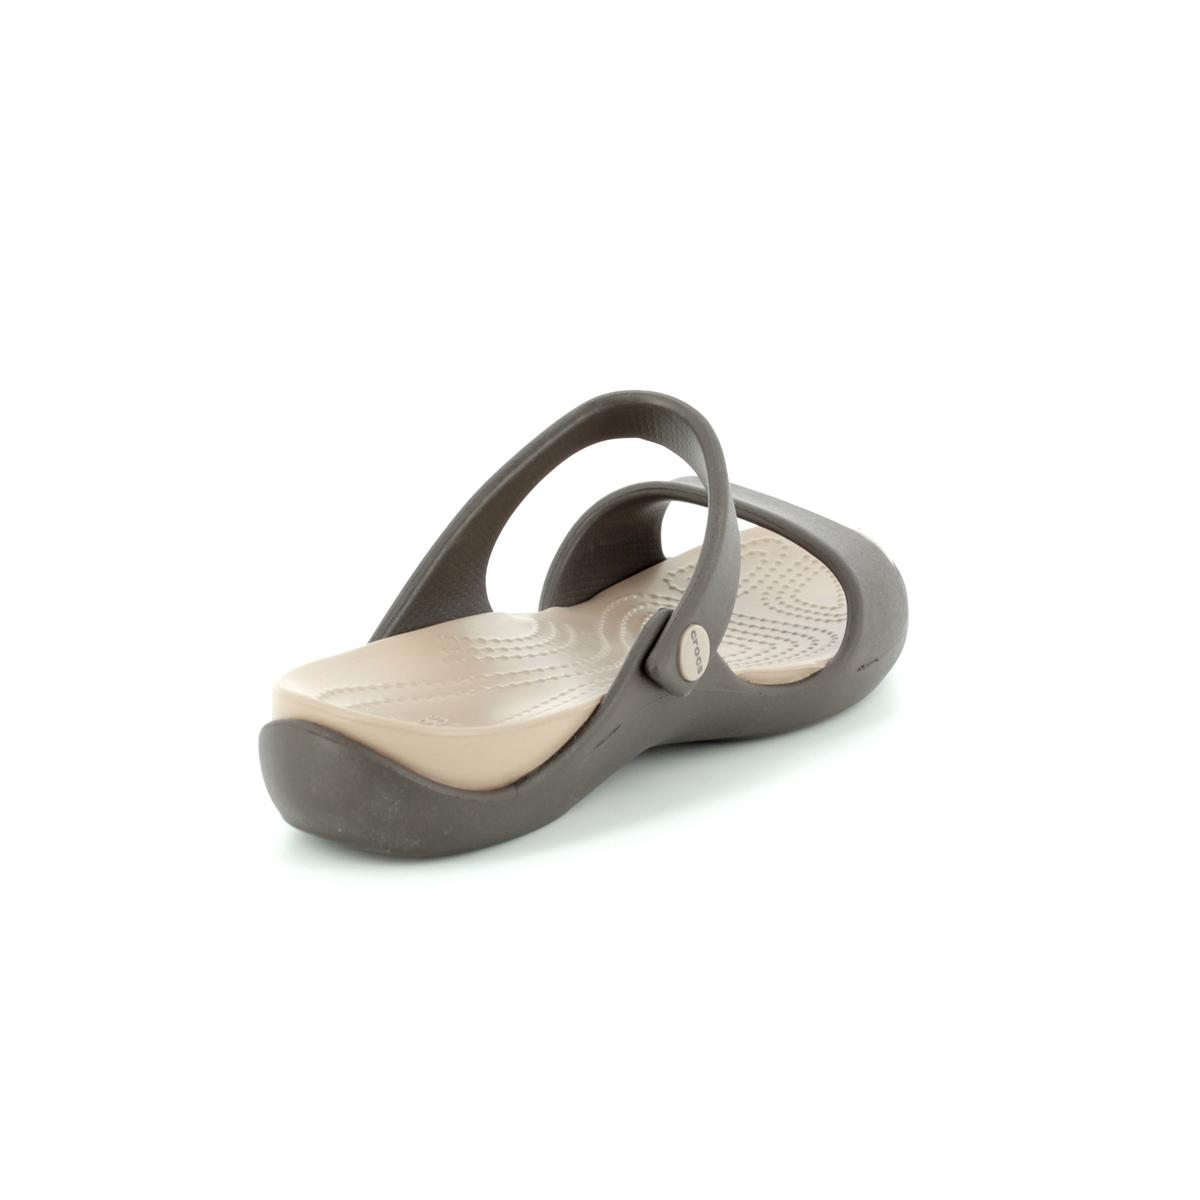 f9ef22bd5b2f Crocs Sandals - Dark brown - 204268 23D CLEO V